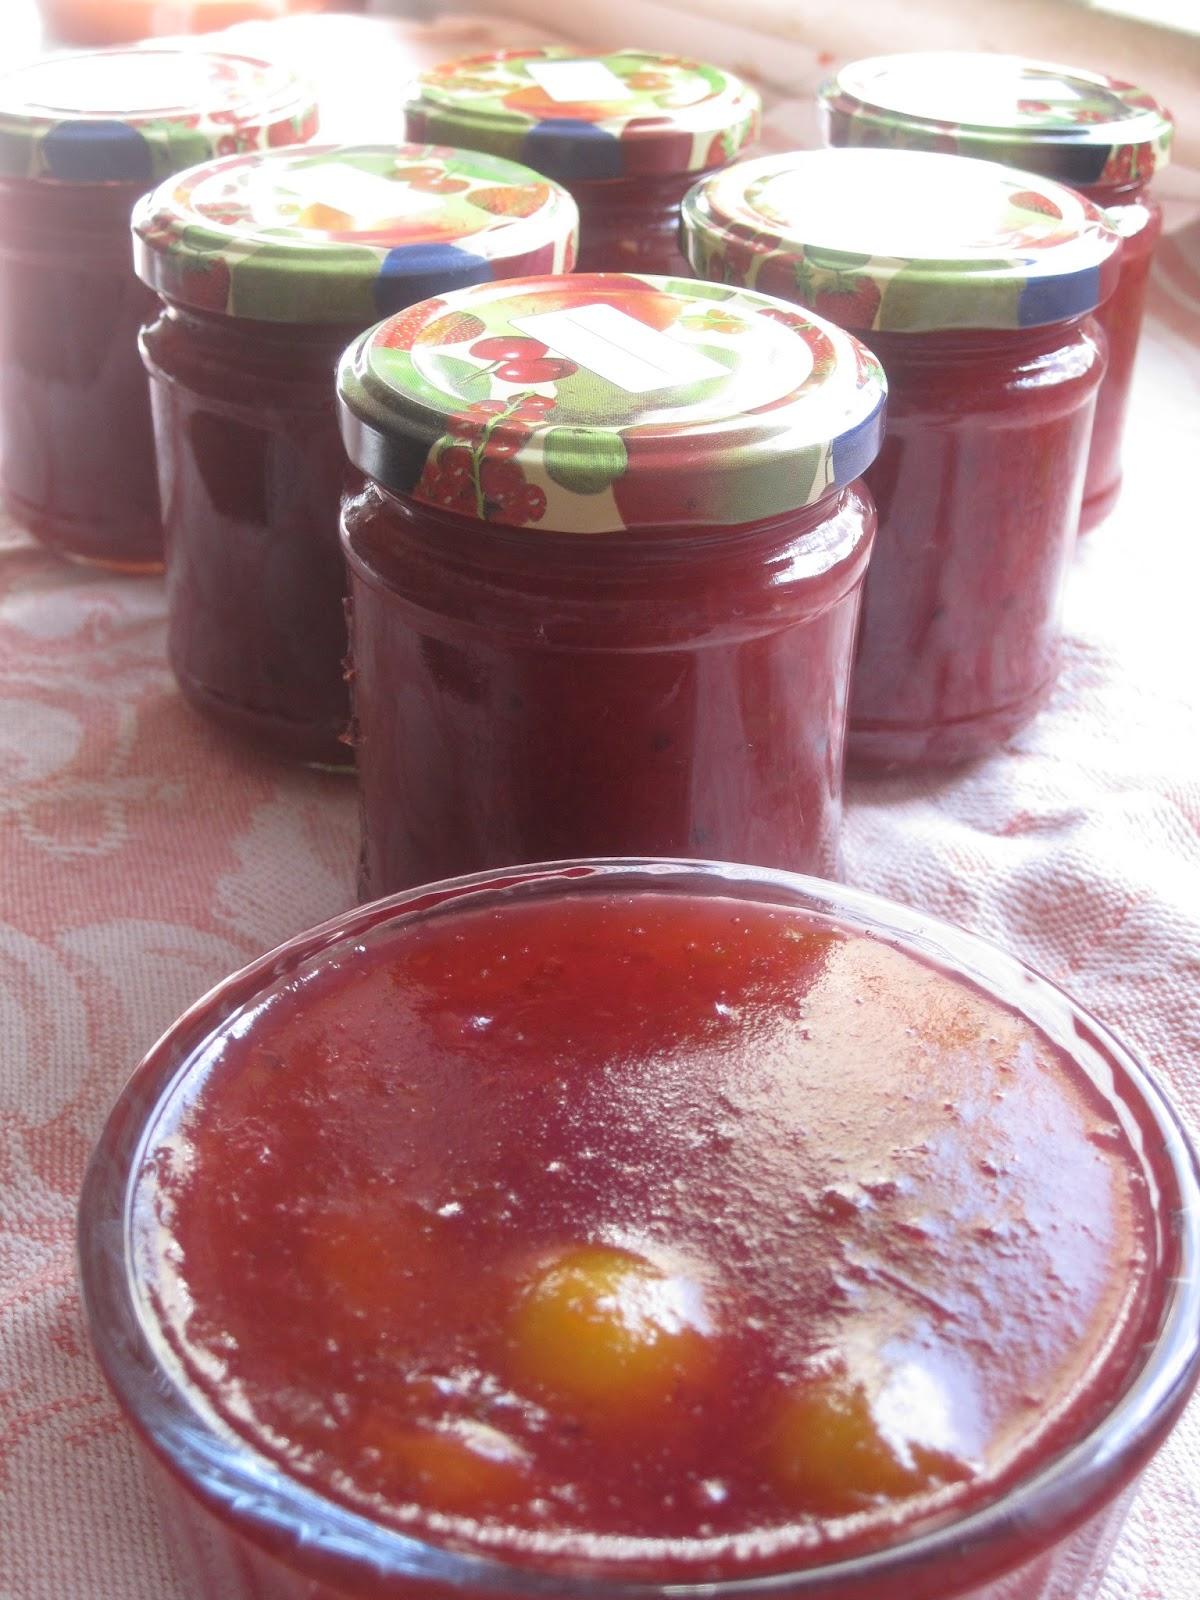 fliederbaum nachgekocht kriecherl ribisel marmelade. Black Bedroom Furniture Sets. Home Design Ideas